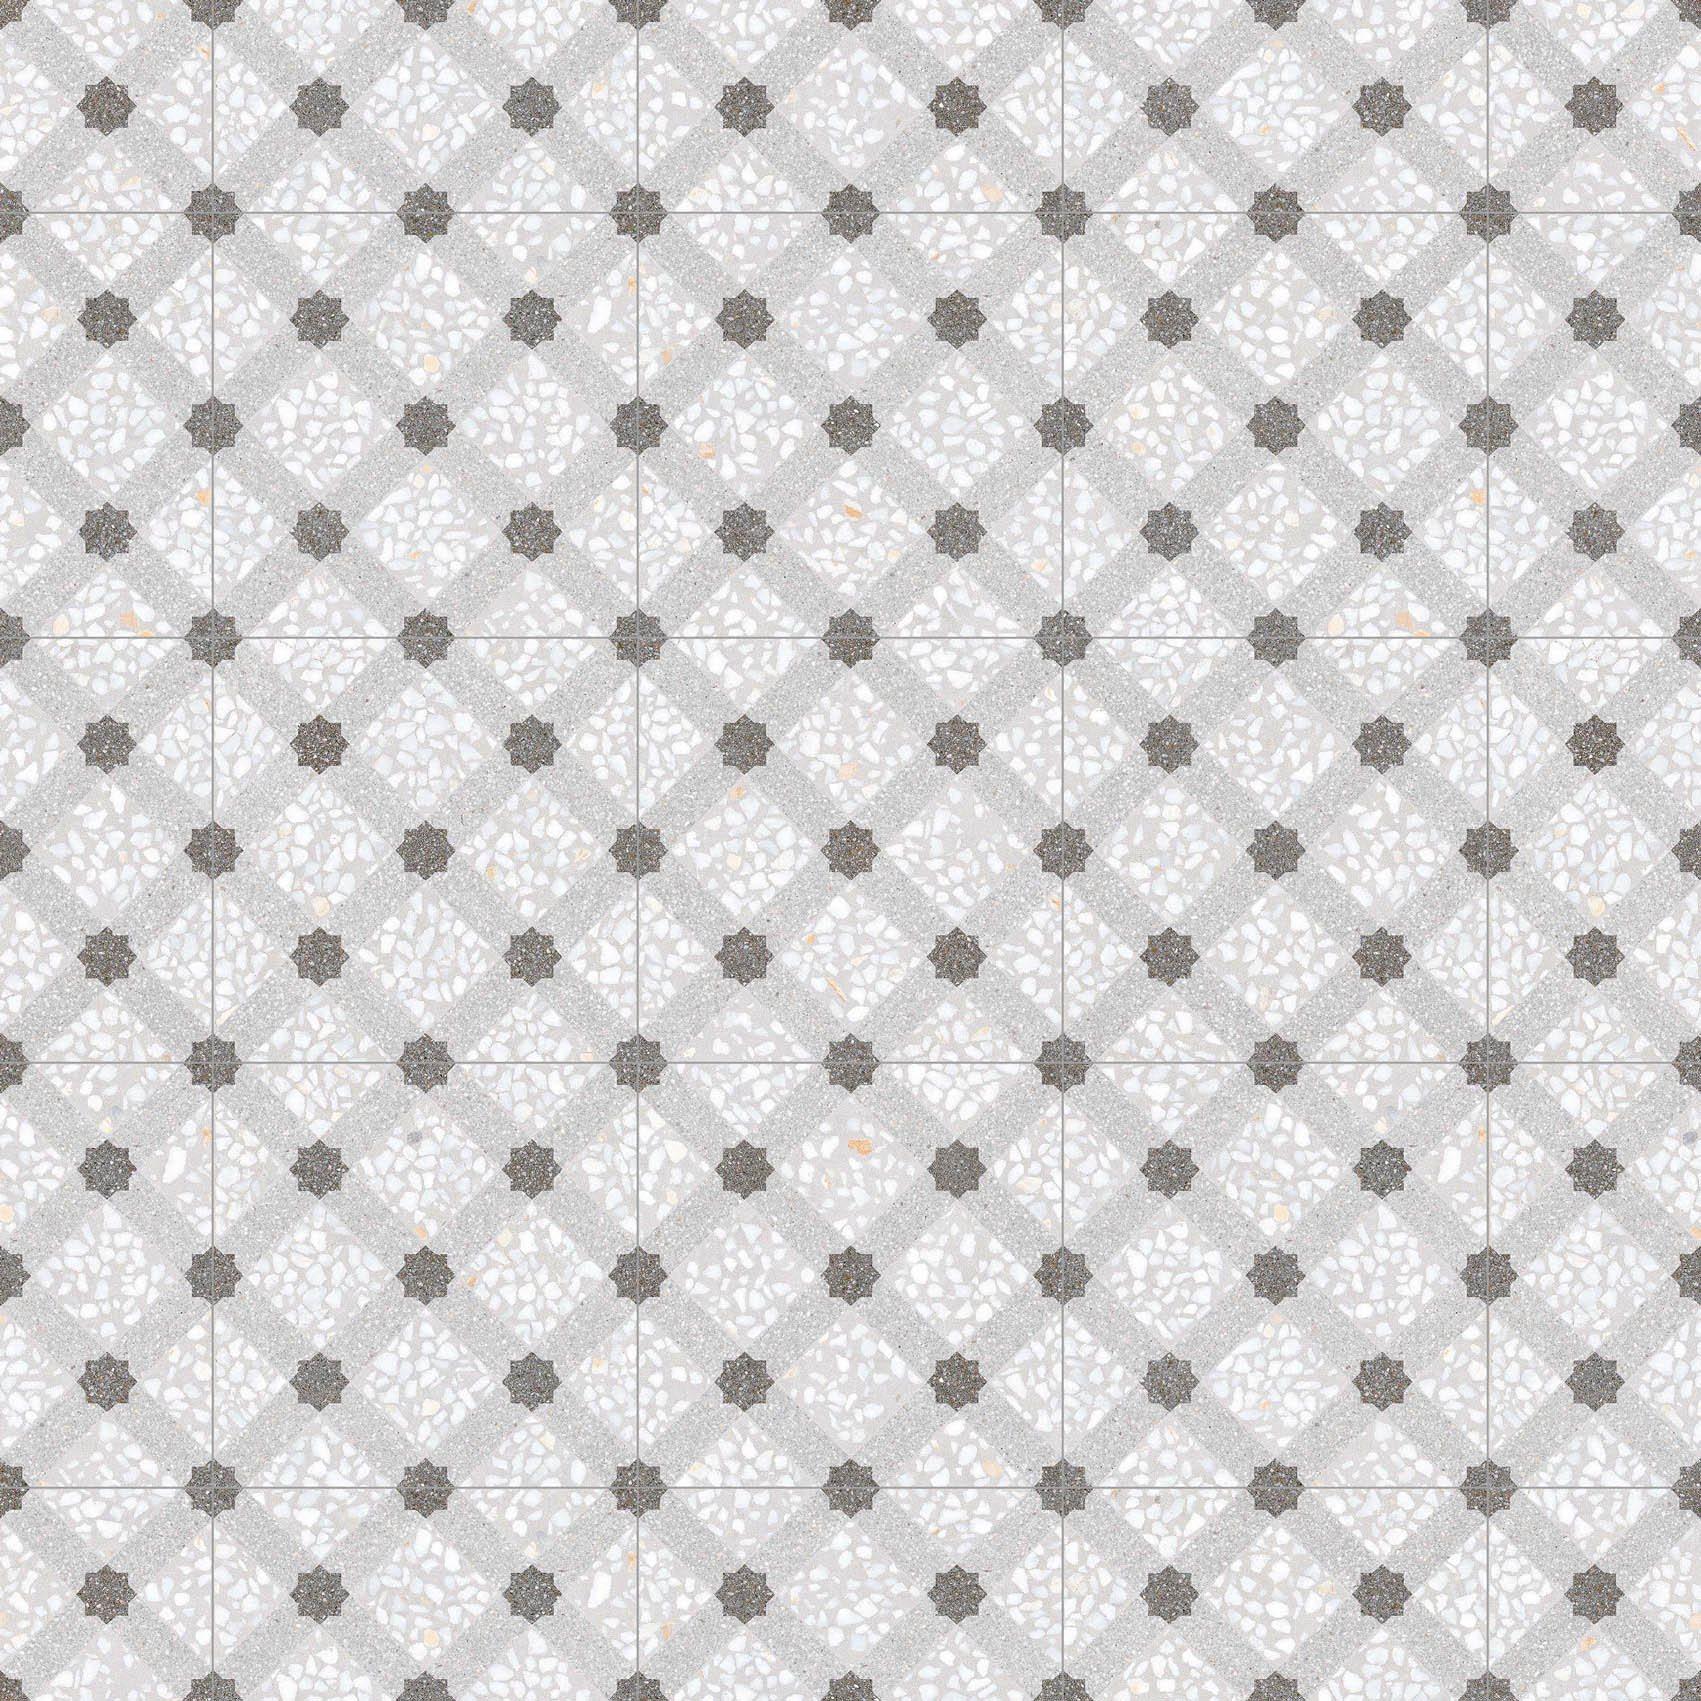 Carrelage imitation ciment 30x30 cm Mancini Humo anti-dérapant R10 - 0.99m² - zoom